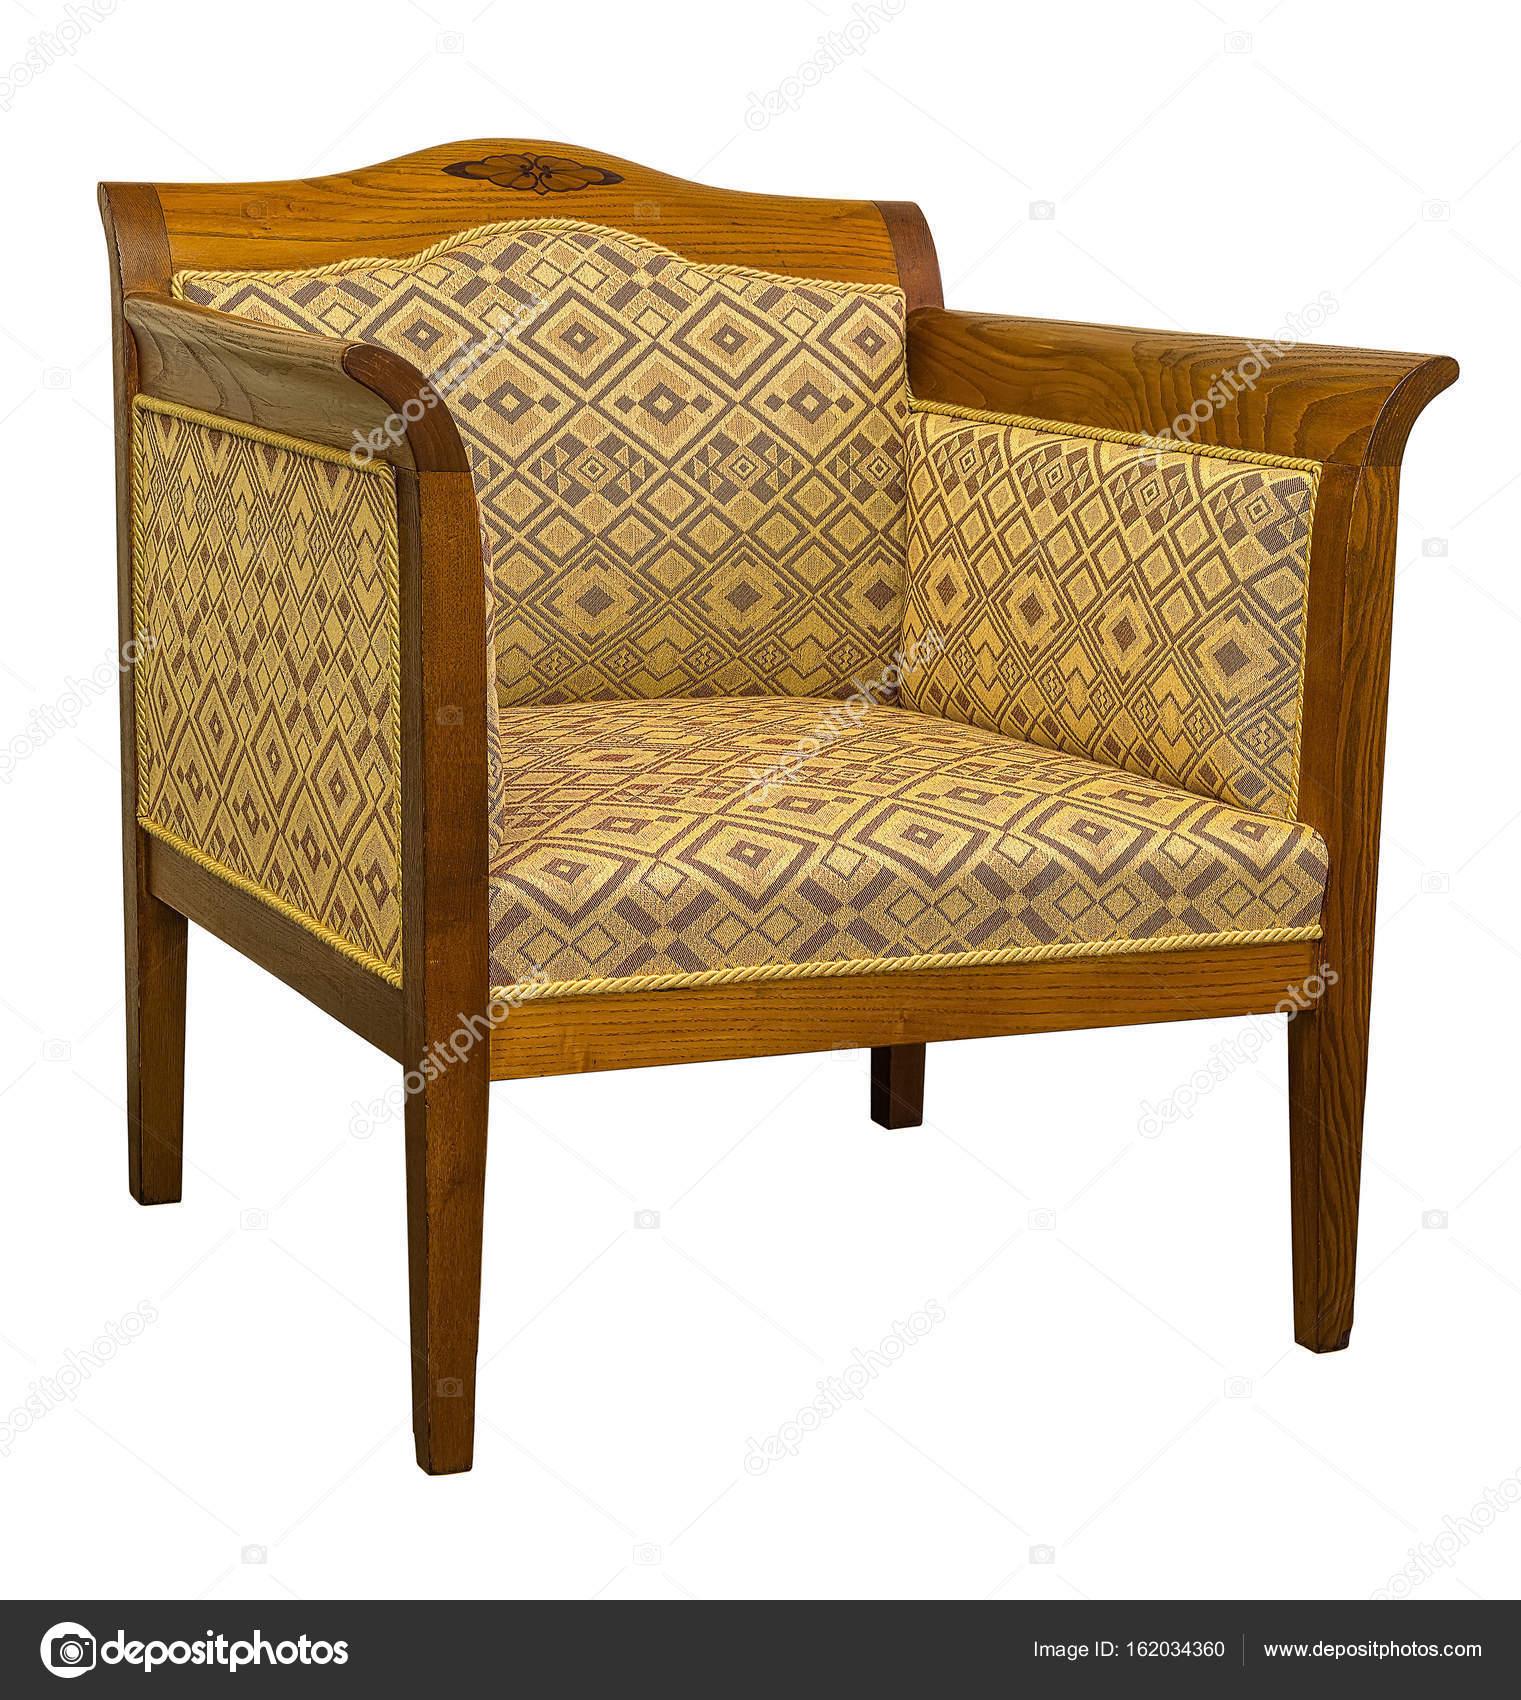 vintage art deco furniture. Vintage Art Deco Chair Sofa Isolated On White Background \u2014 Stock Photo Furniture R